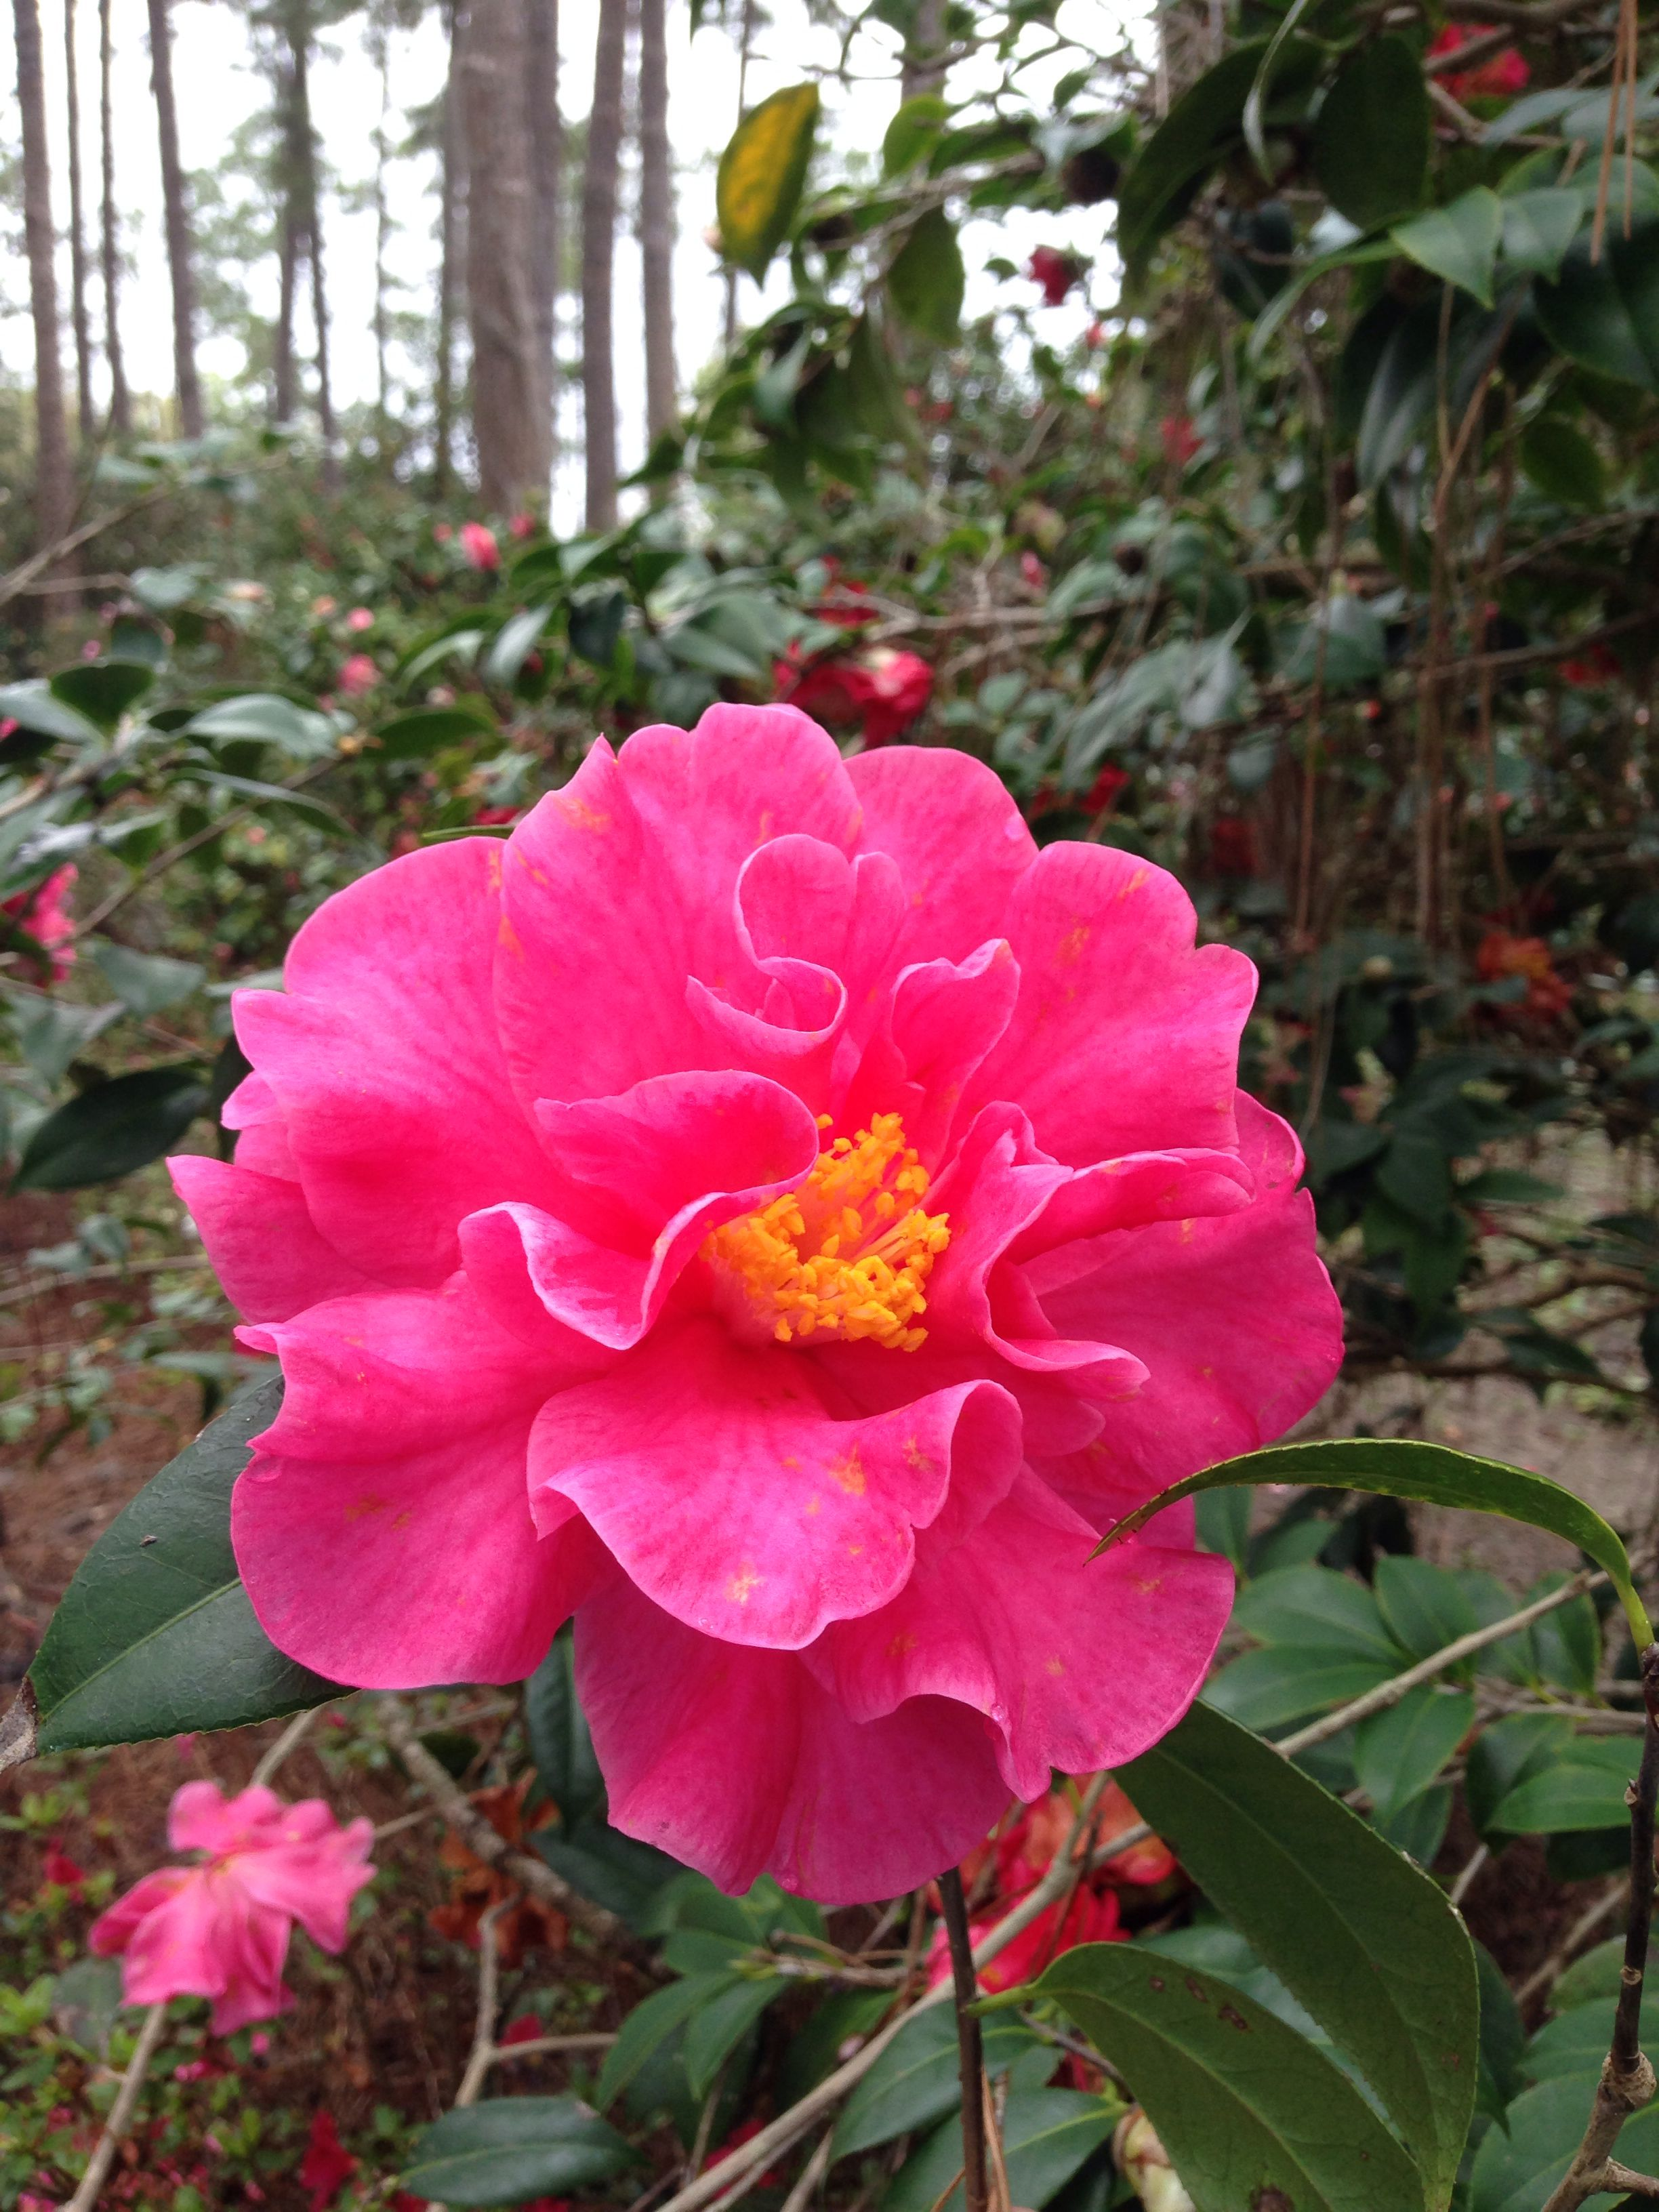 Camellia Frank Houser Bob Wines Camellia Gardens Ocala Fl Garden Projects Camellia Flowers